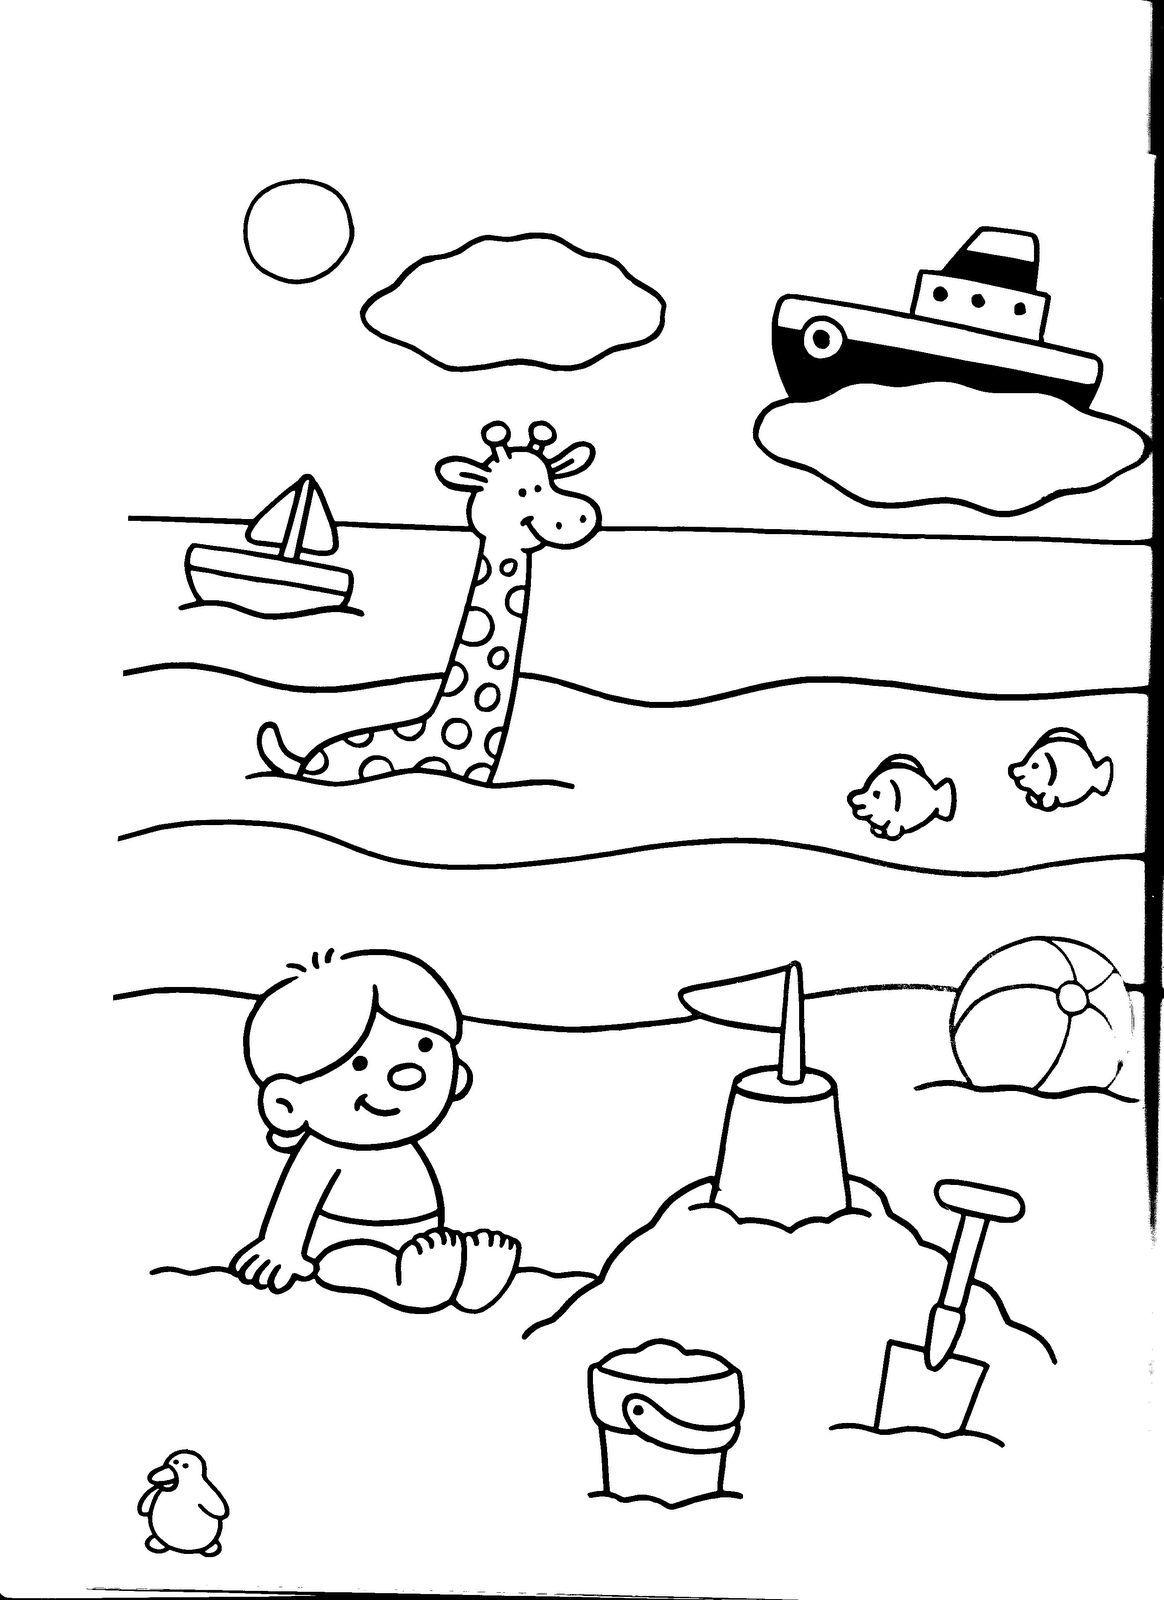 Absurdos Actividades Para Ninos Preescolar Actividades De Aprendizaje Para Ninos Ejercicios Para Ninos